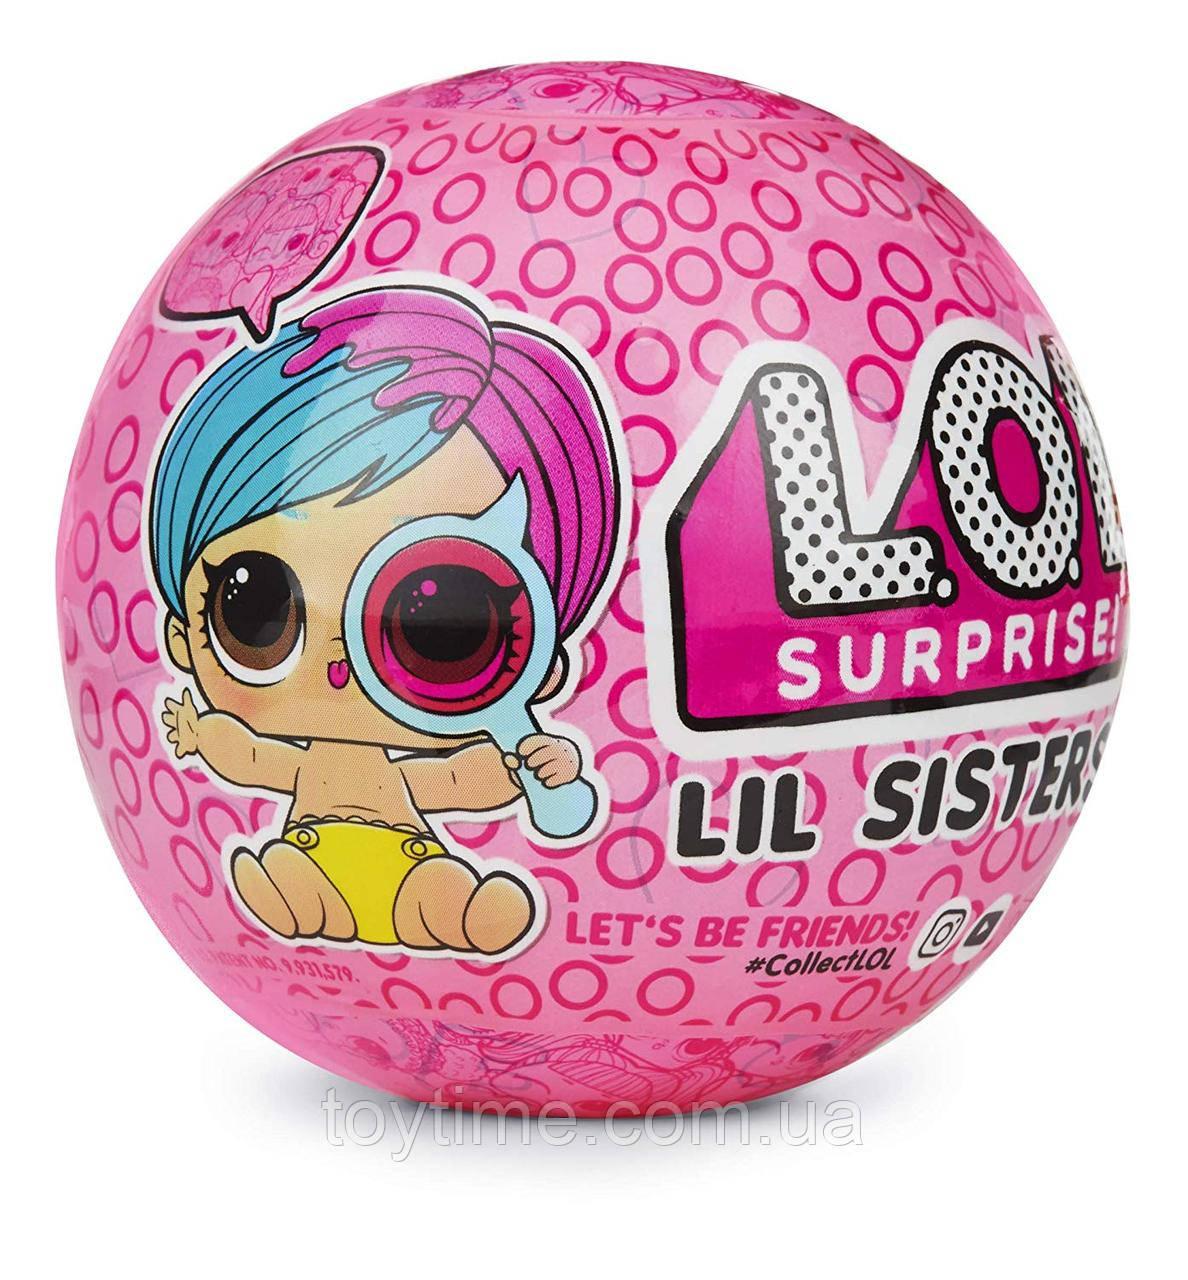 L.O.L. сестрички декодер 4 сезон серия 2 шпионы / L.O.L. Surprise! Lil Sisters Eye Spy series 2